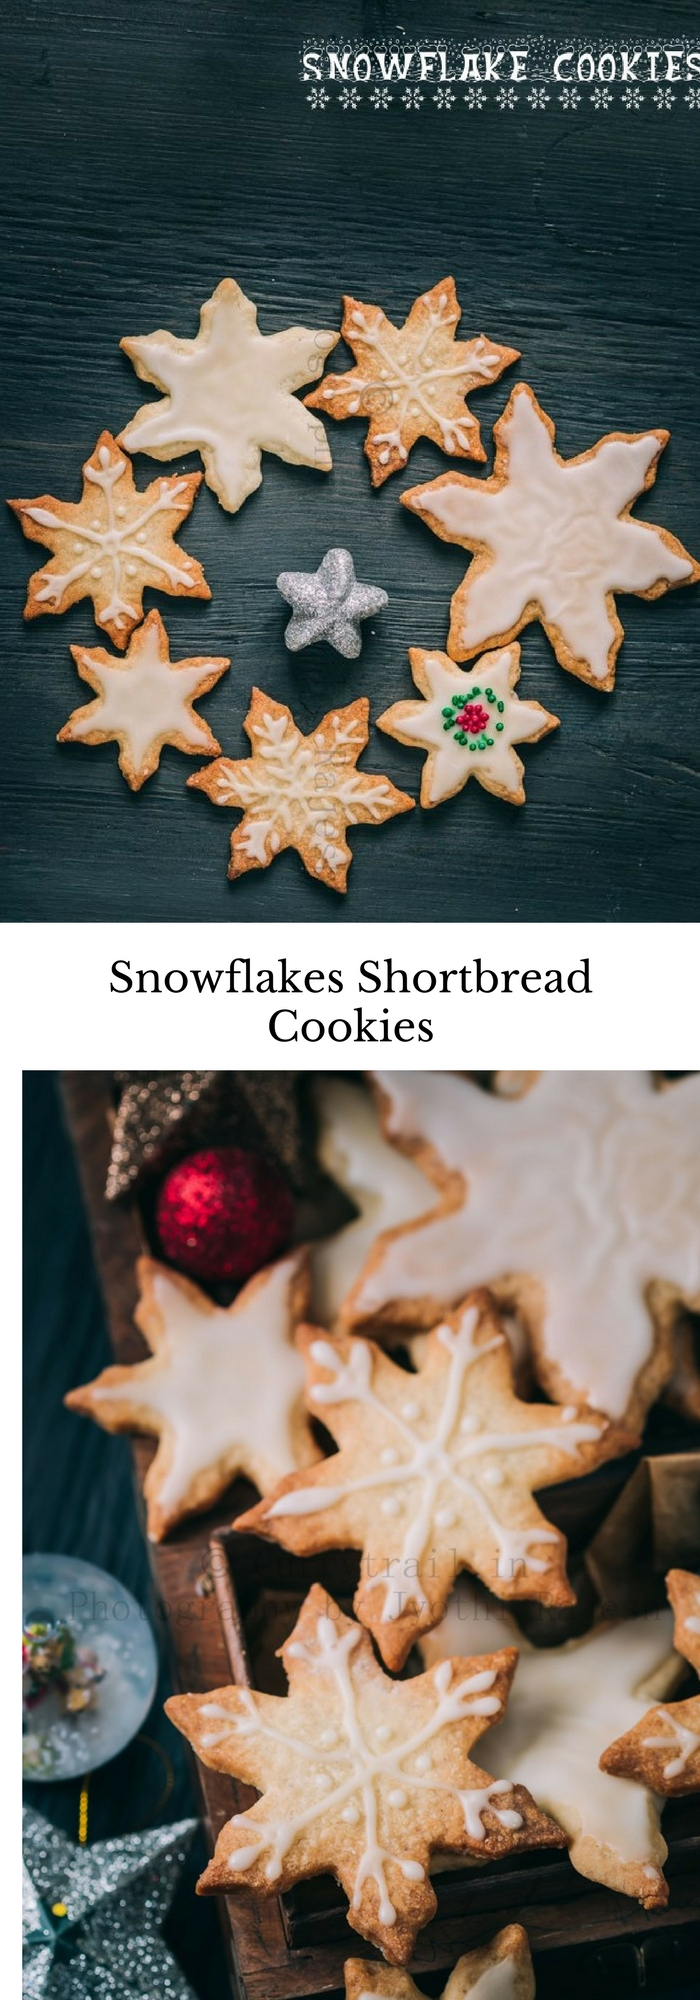 Snowflakes Shortbread Cookie